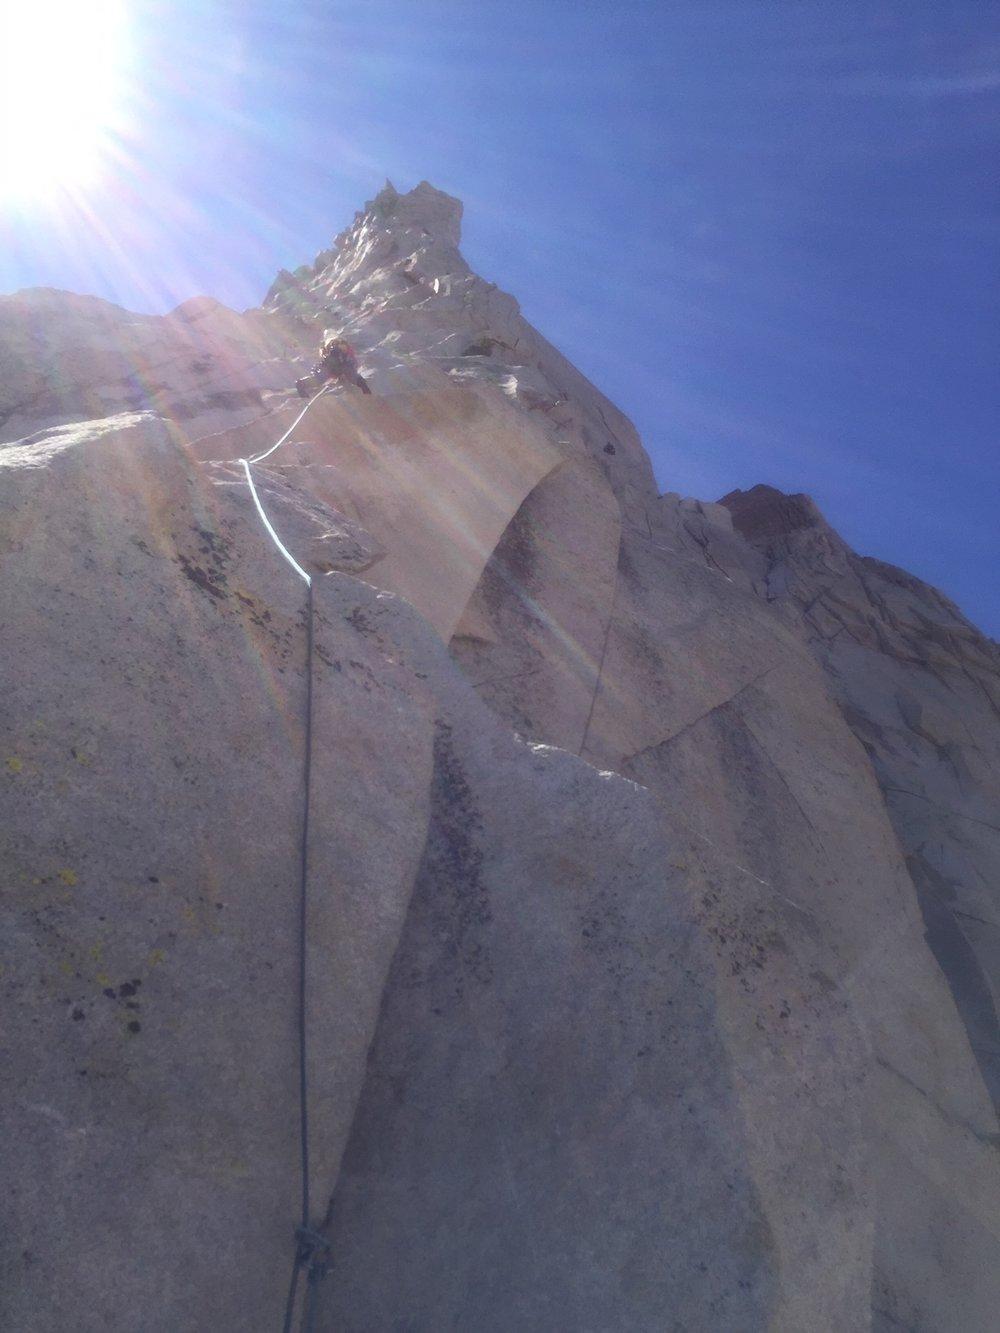 Alpine Climbing Sierra Mountains Rock Climbing SAANO Adventures Trad Climbing Multi Pitch.JPG